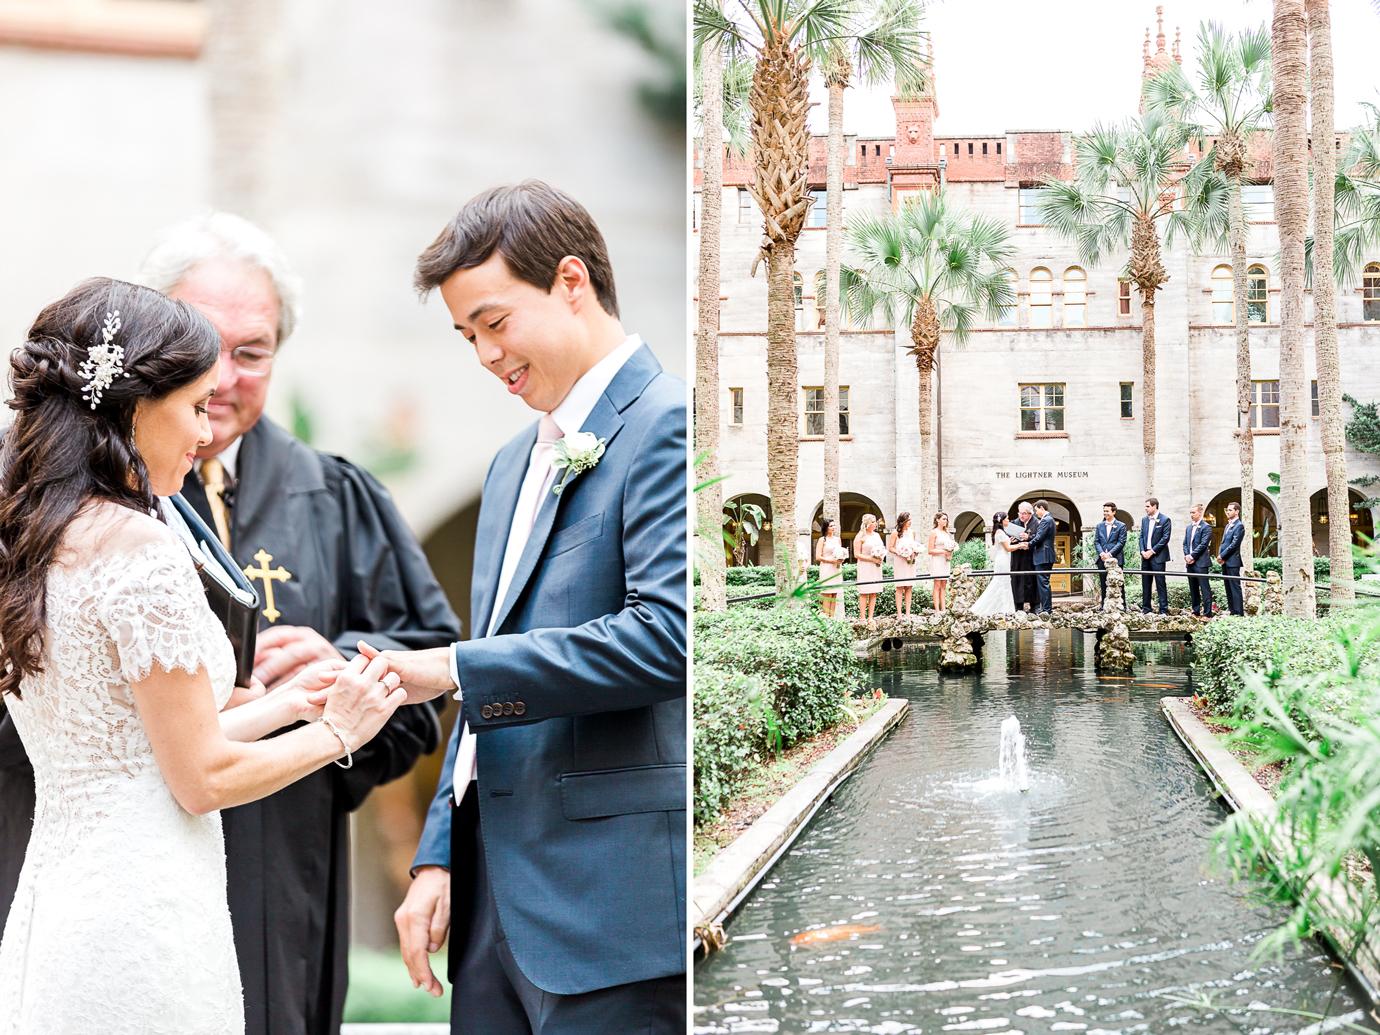 Wedding ceremony in the Lightner Museum courtyard